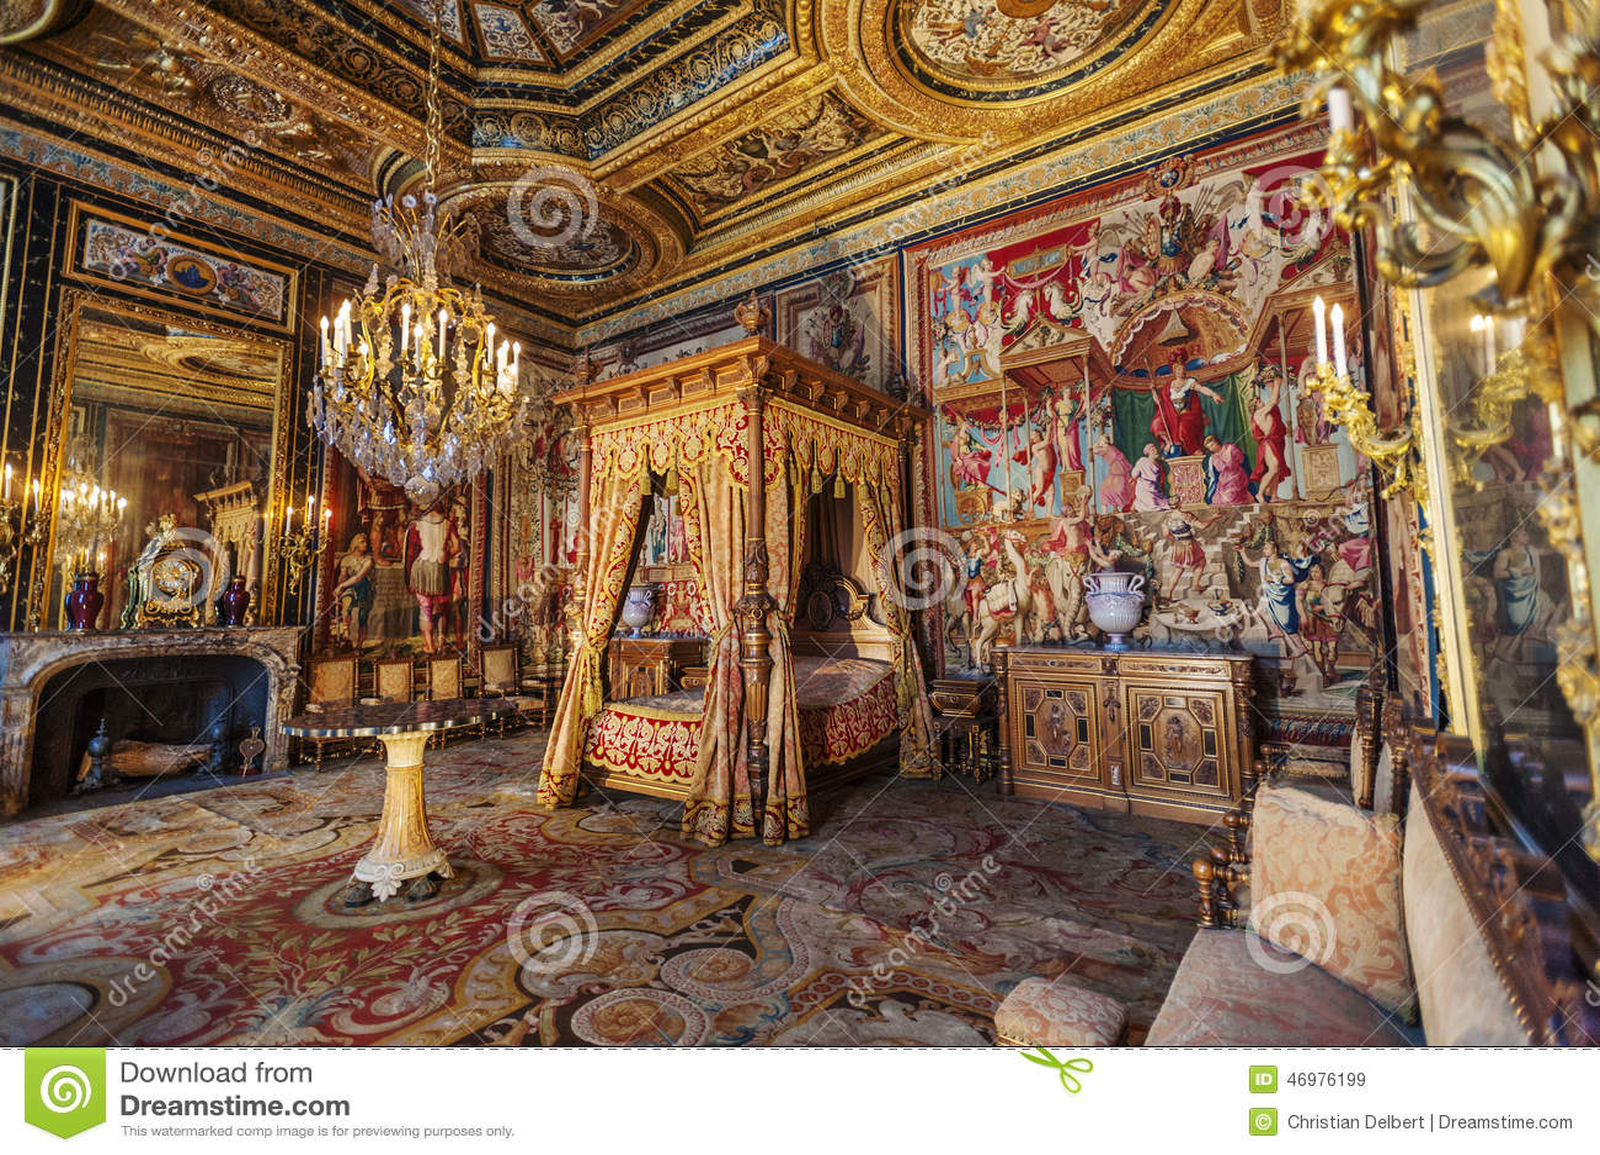 Queen Ann Slaapkamer : Chateau De Fontainebleau Bedroom